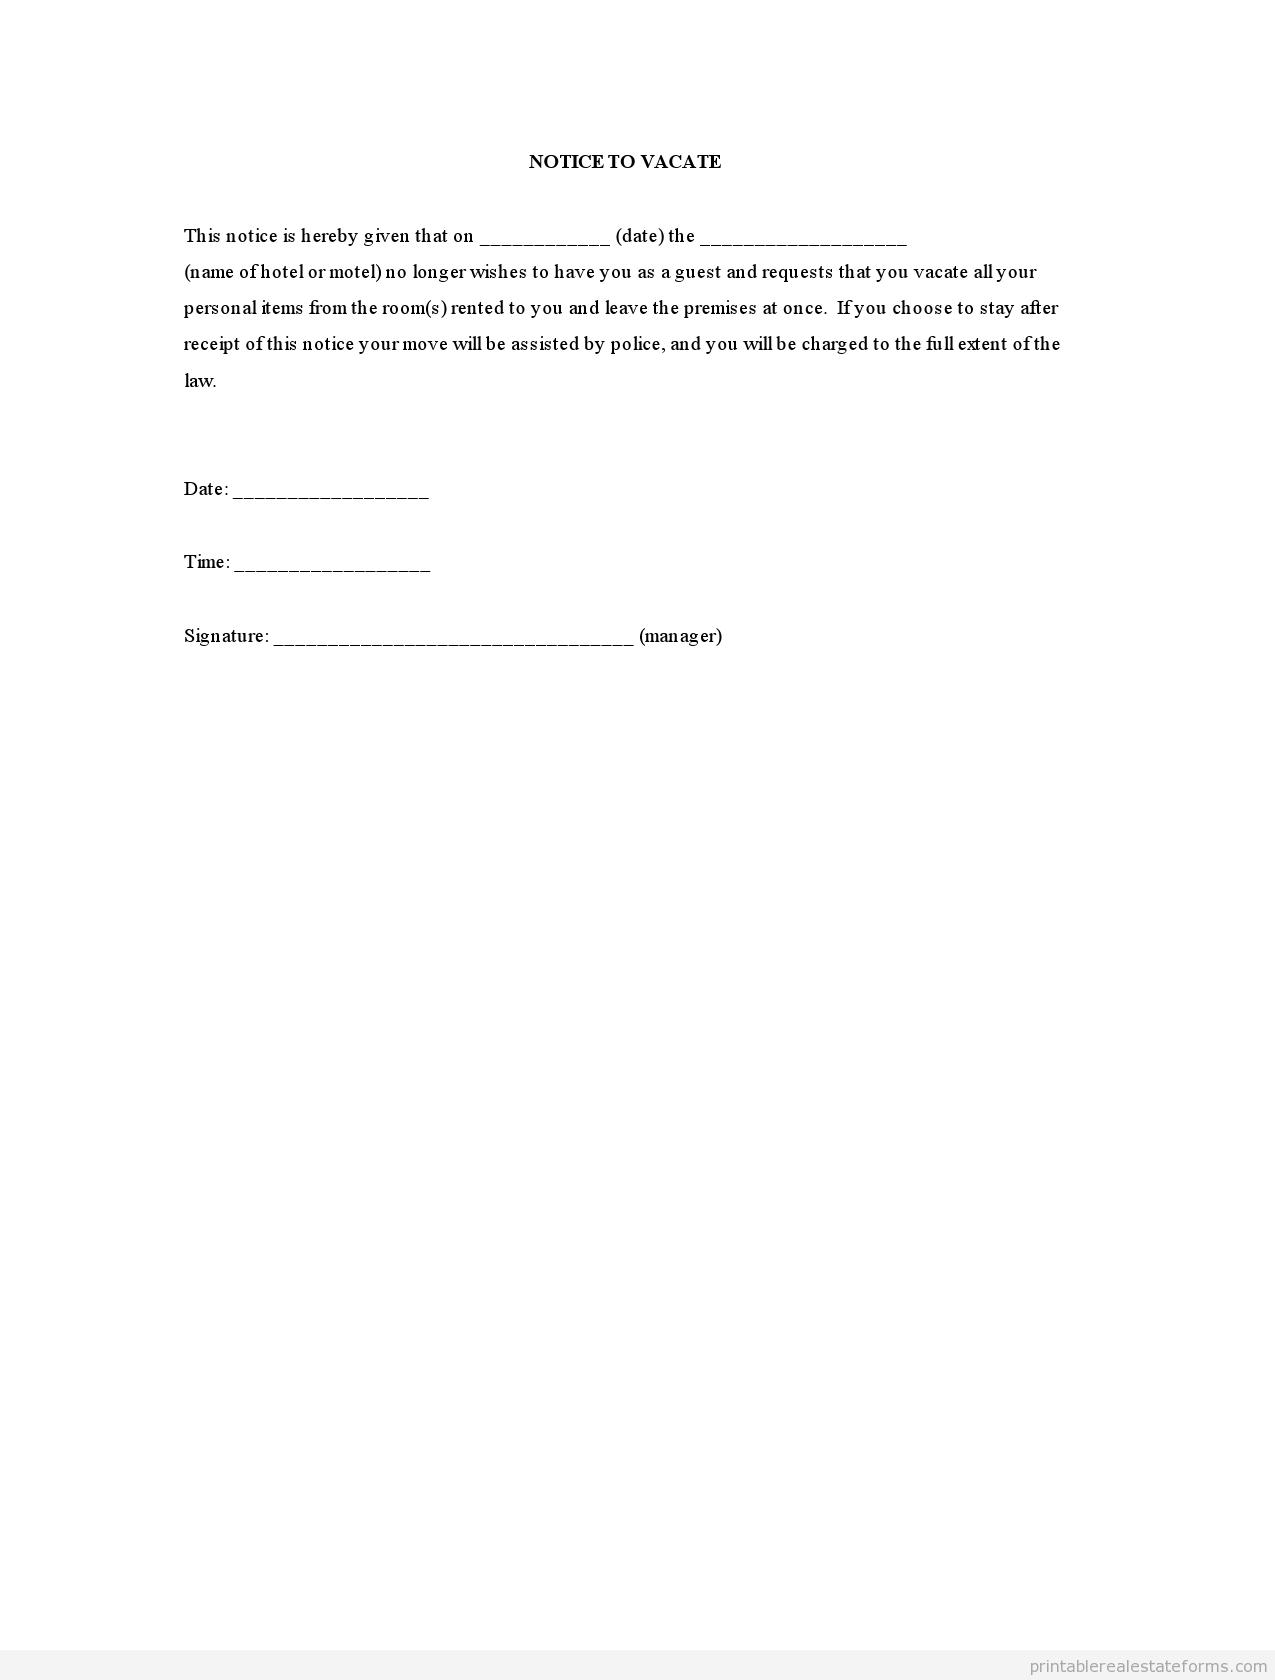 similiar printable notice to vacate form keywords